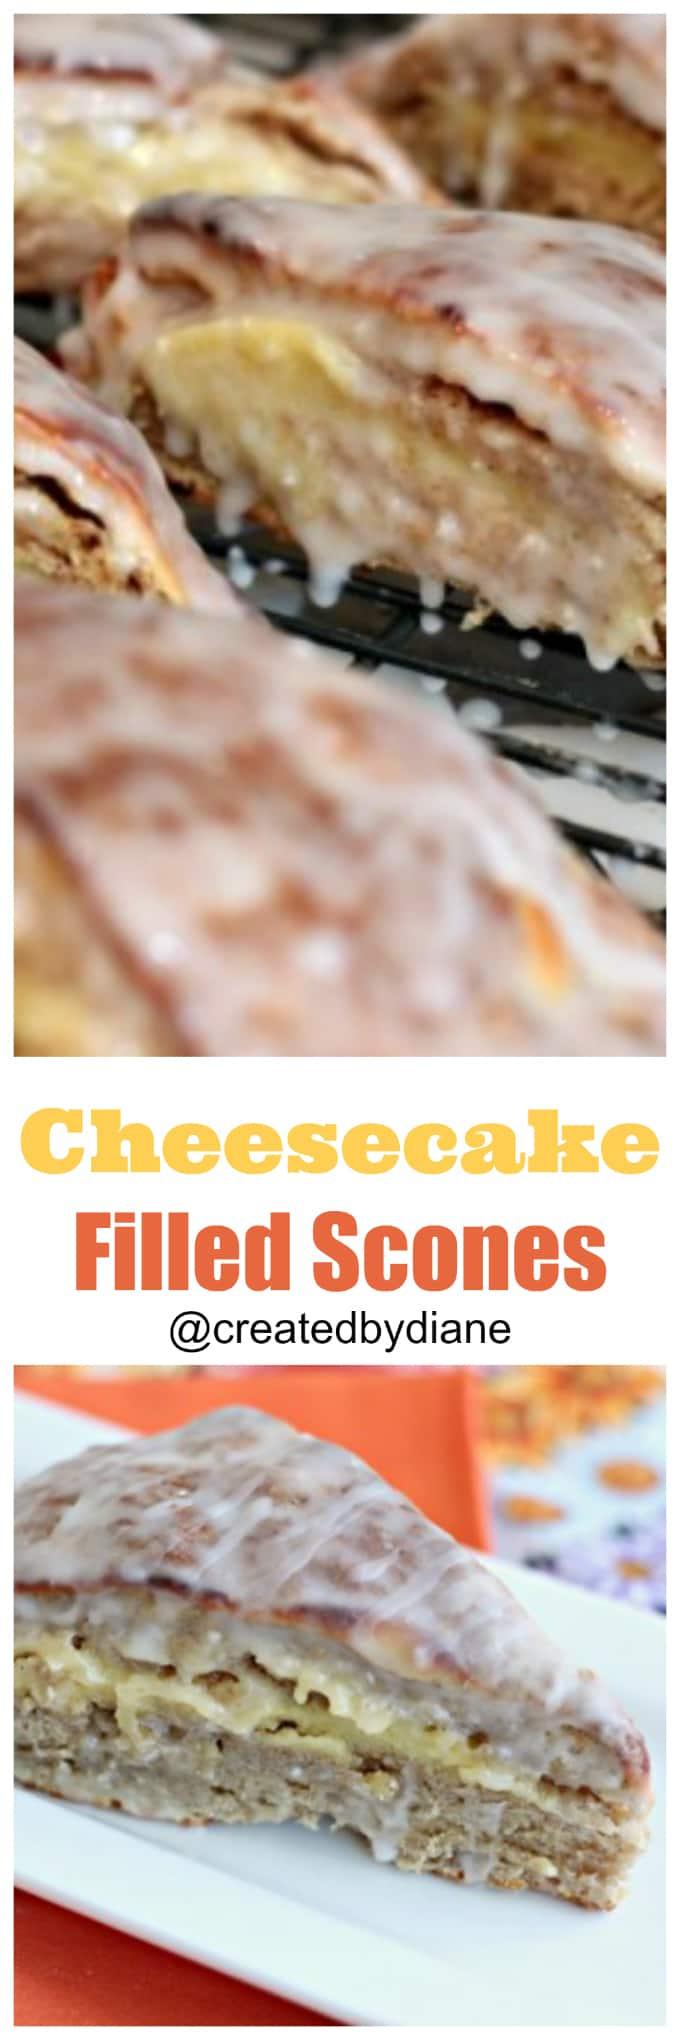 cheesecake filled scones @createdbydiane